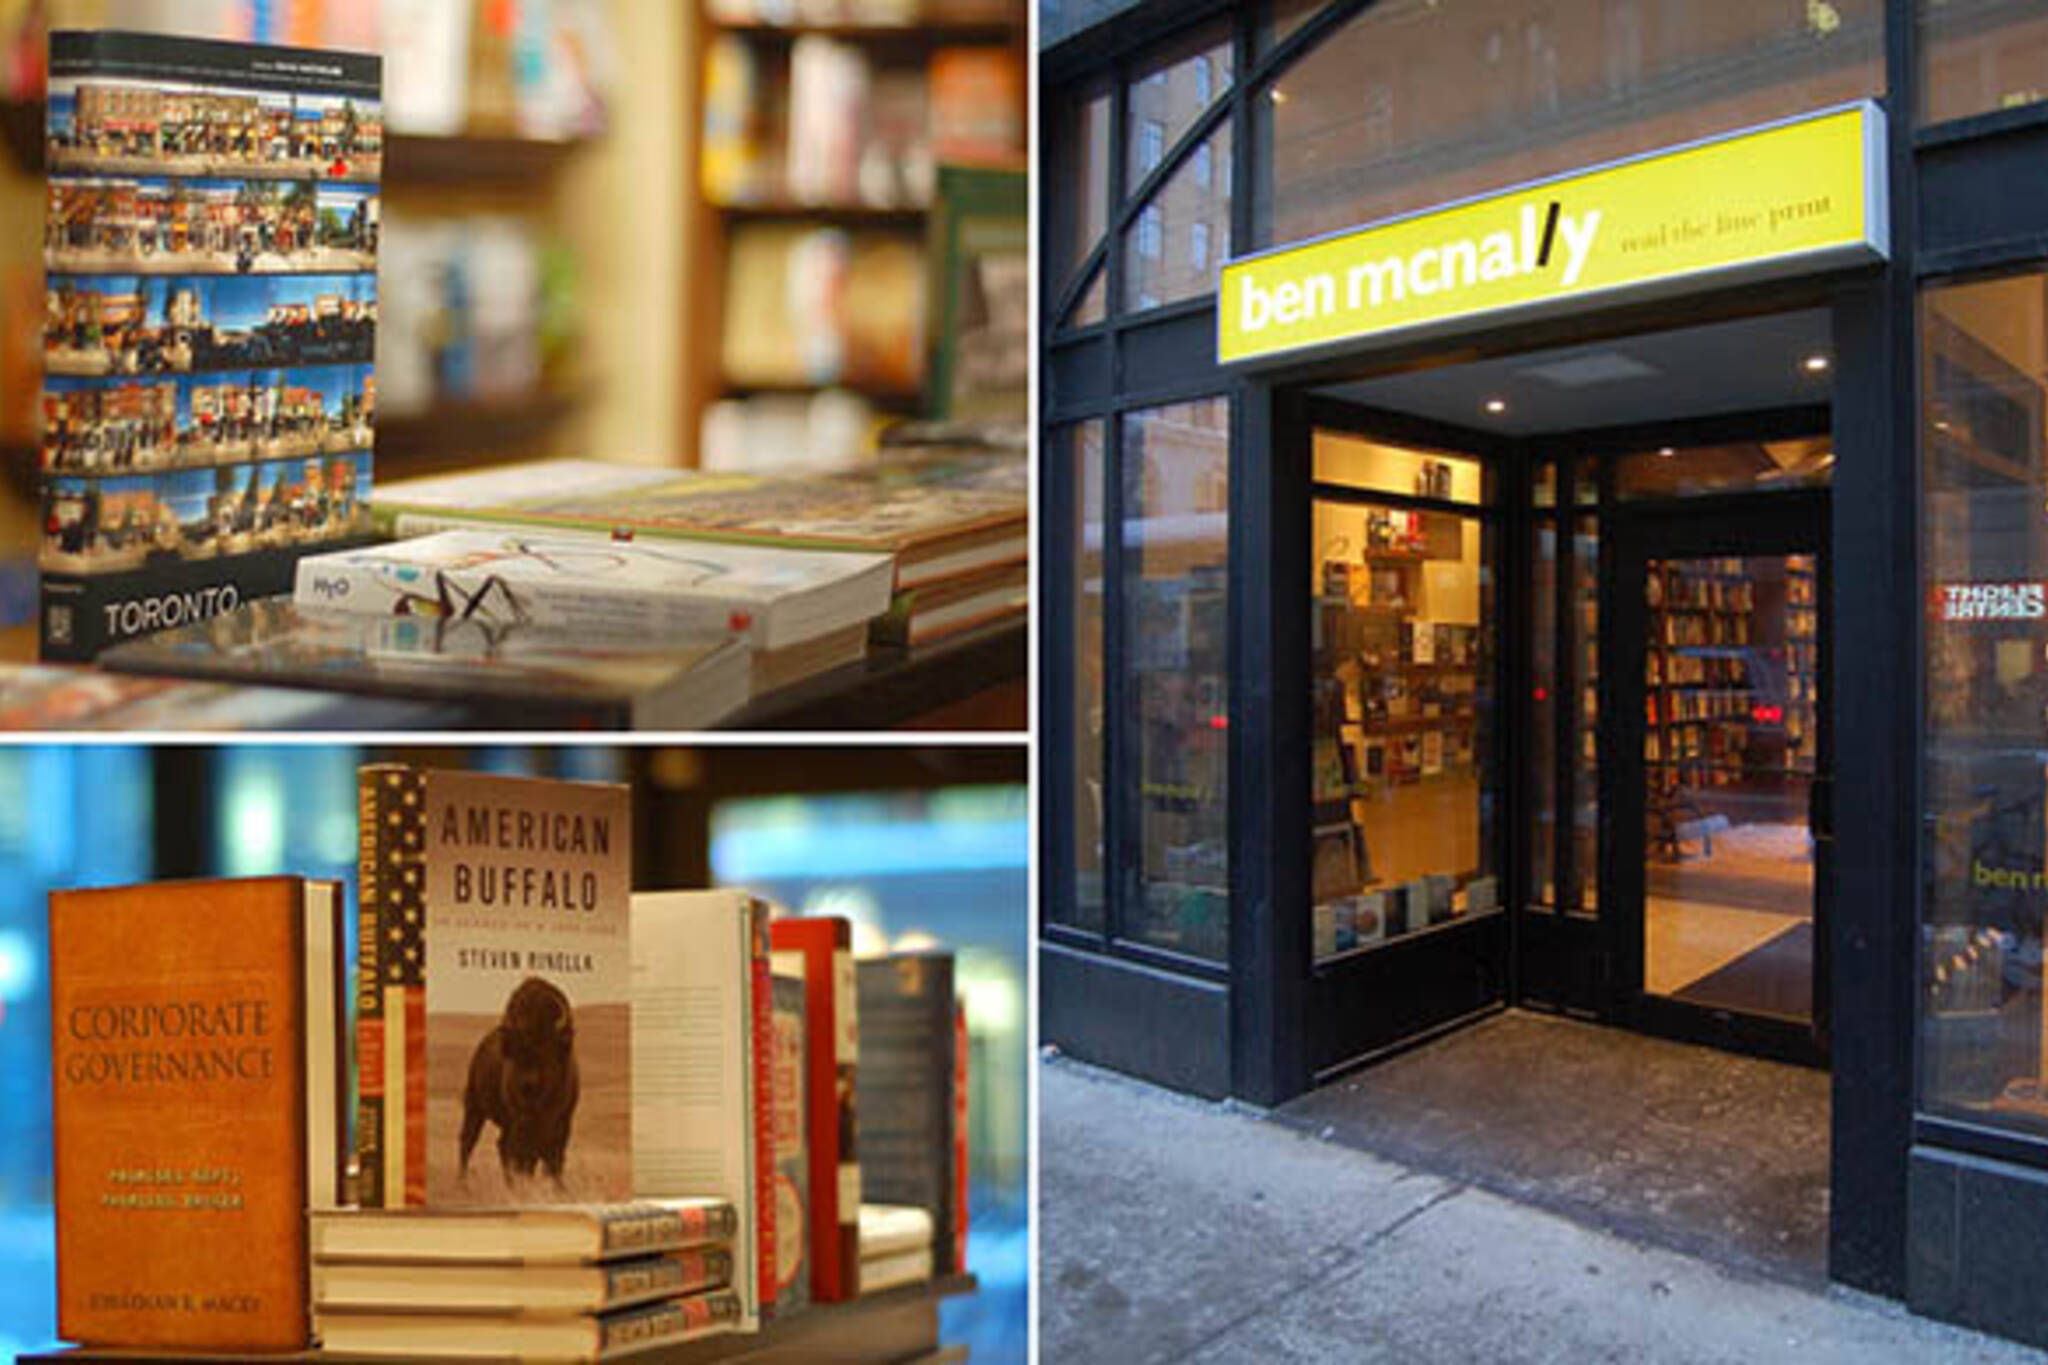 Ben McNally Books